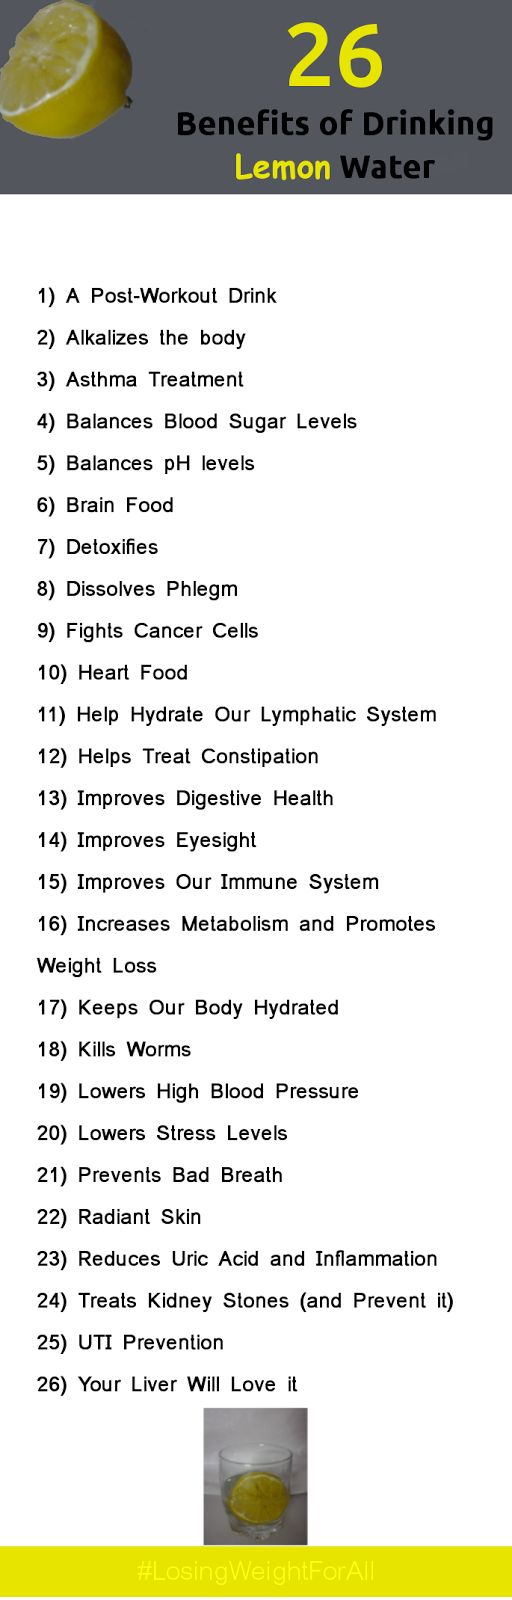 26 Benefits of Drinking Lemon Water